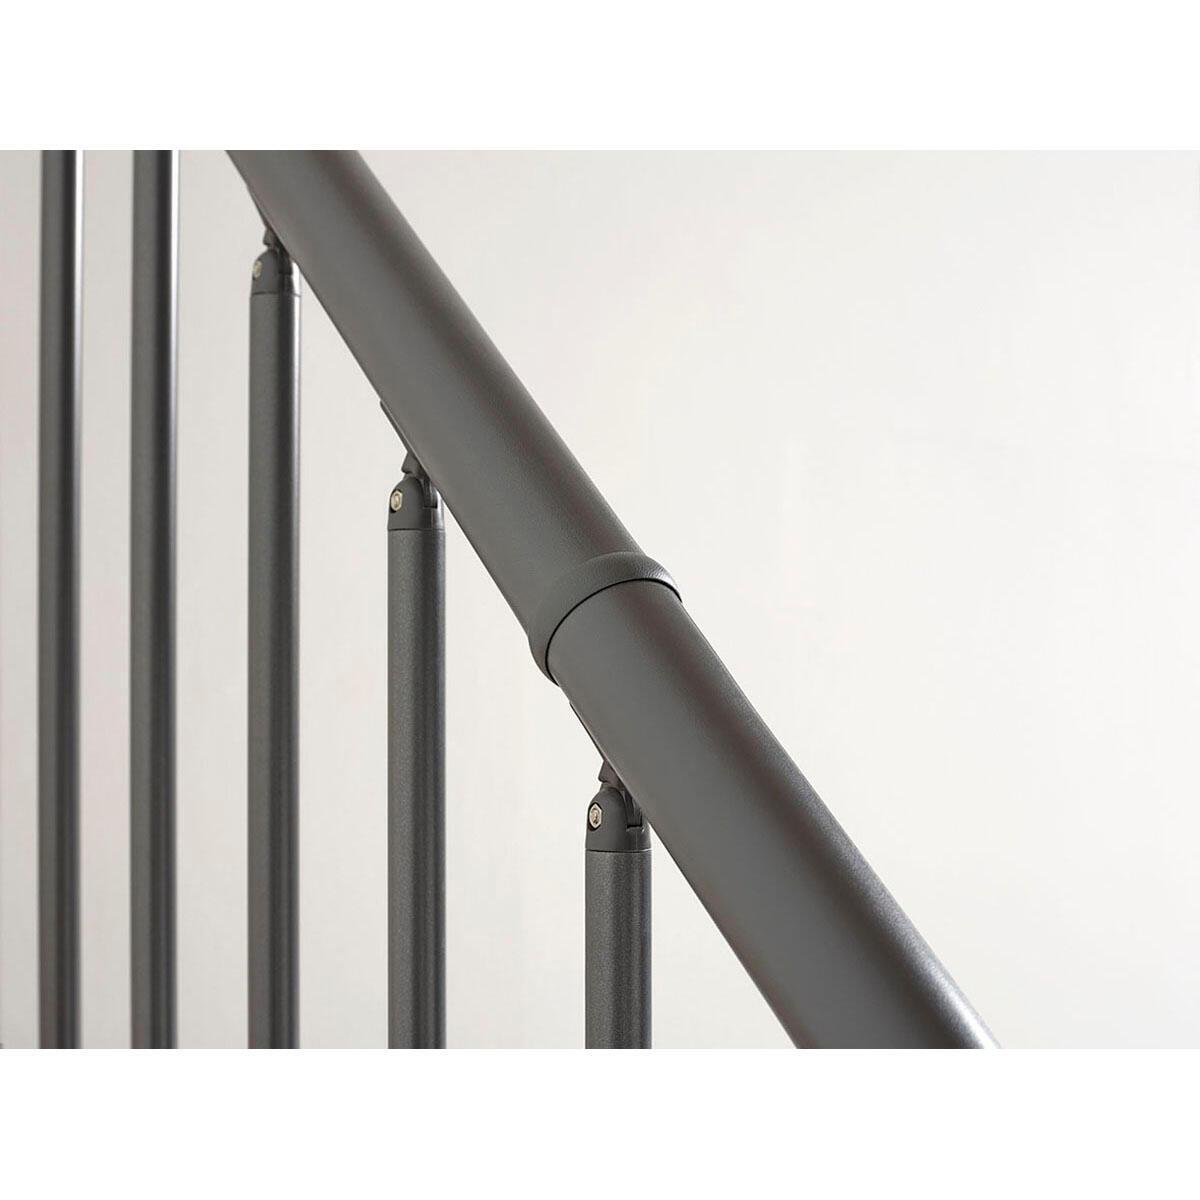 Scala a rampa 1/4 di giro OAK90 FONTANOT L 70 cm, gradino naturale, struttura antracite - 5